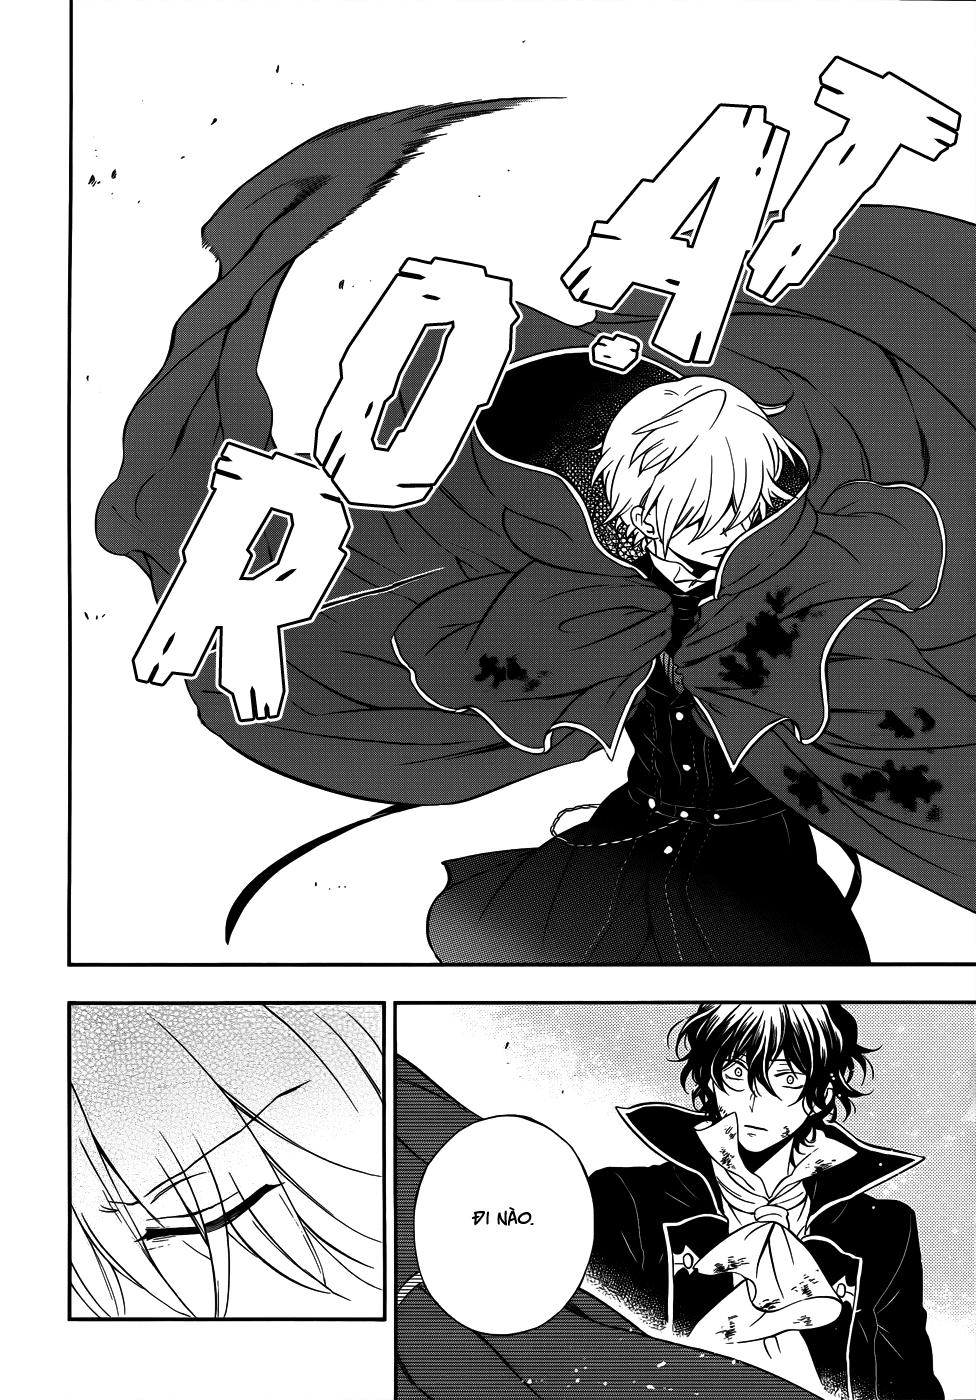 Pandora Hearts chương 098 trang 36